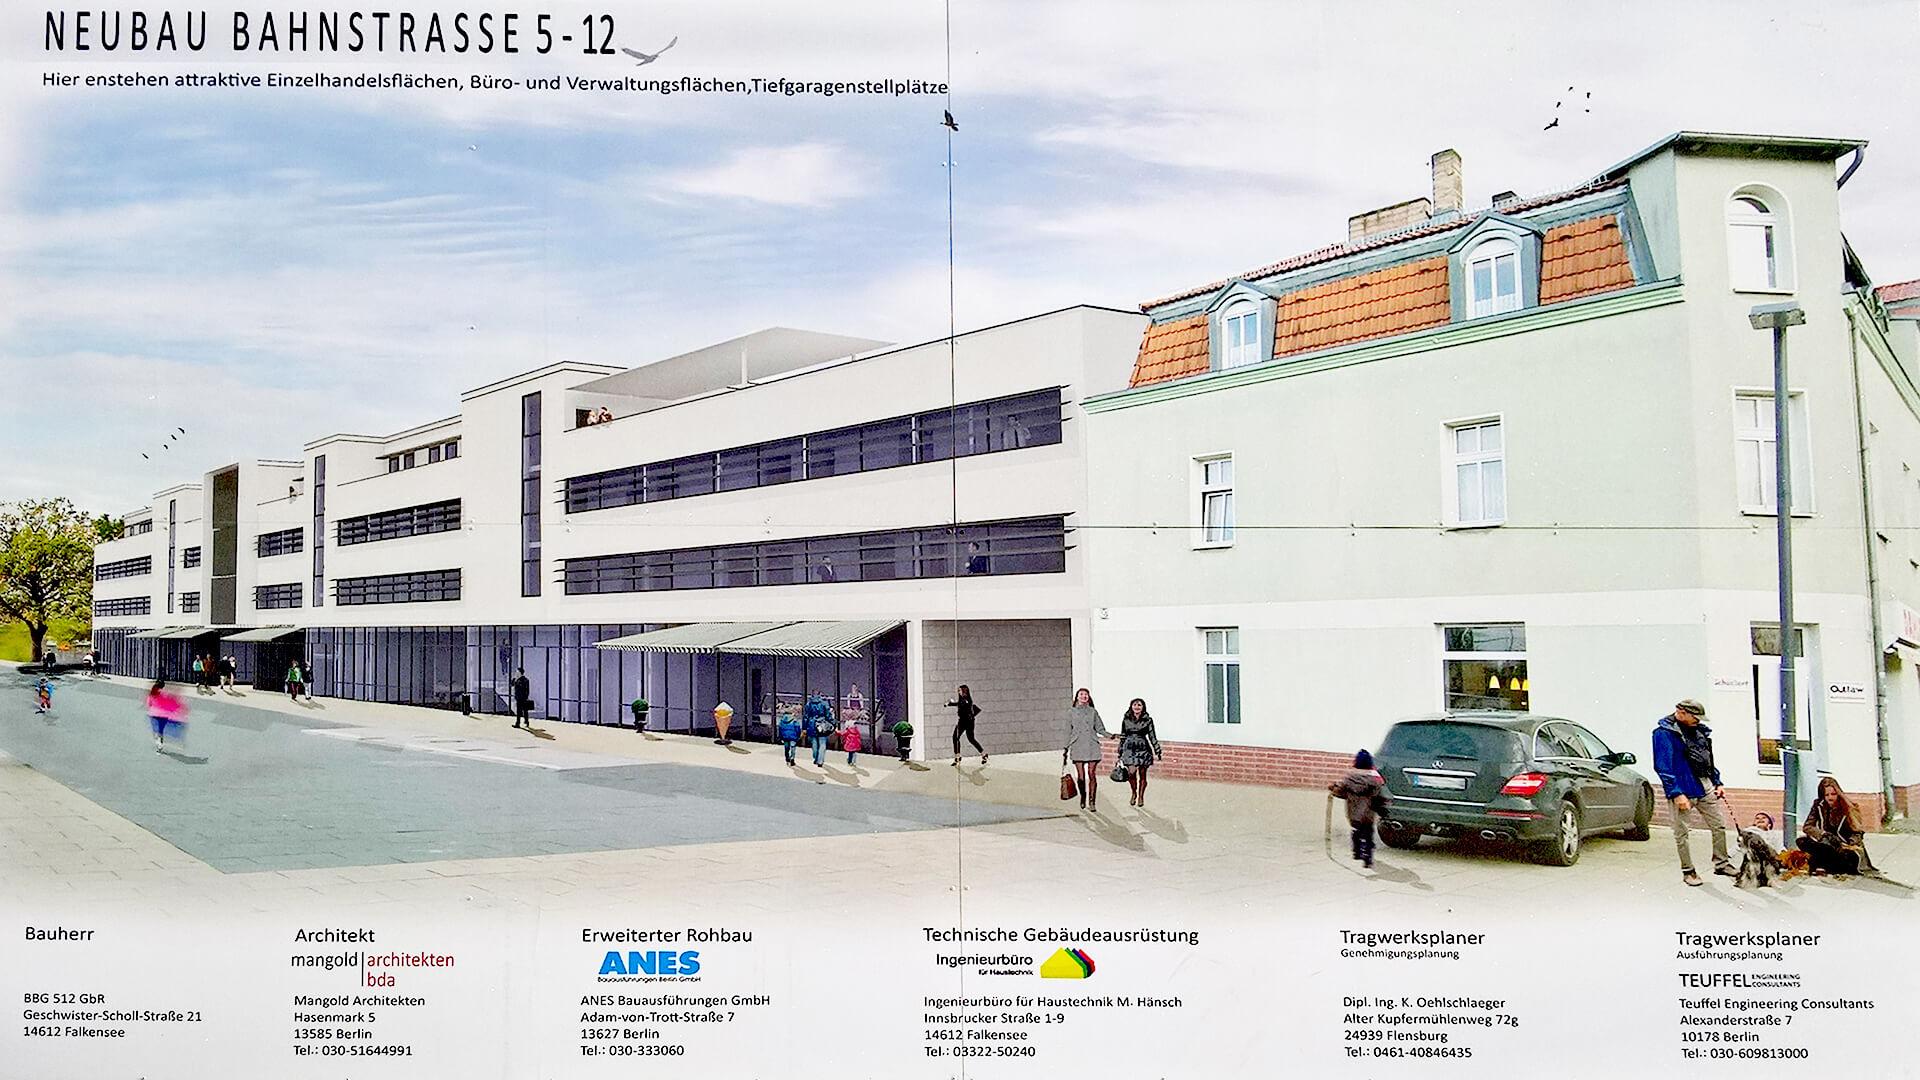 Architekt Flensburg projects teuffel engineering consultants